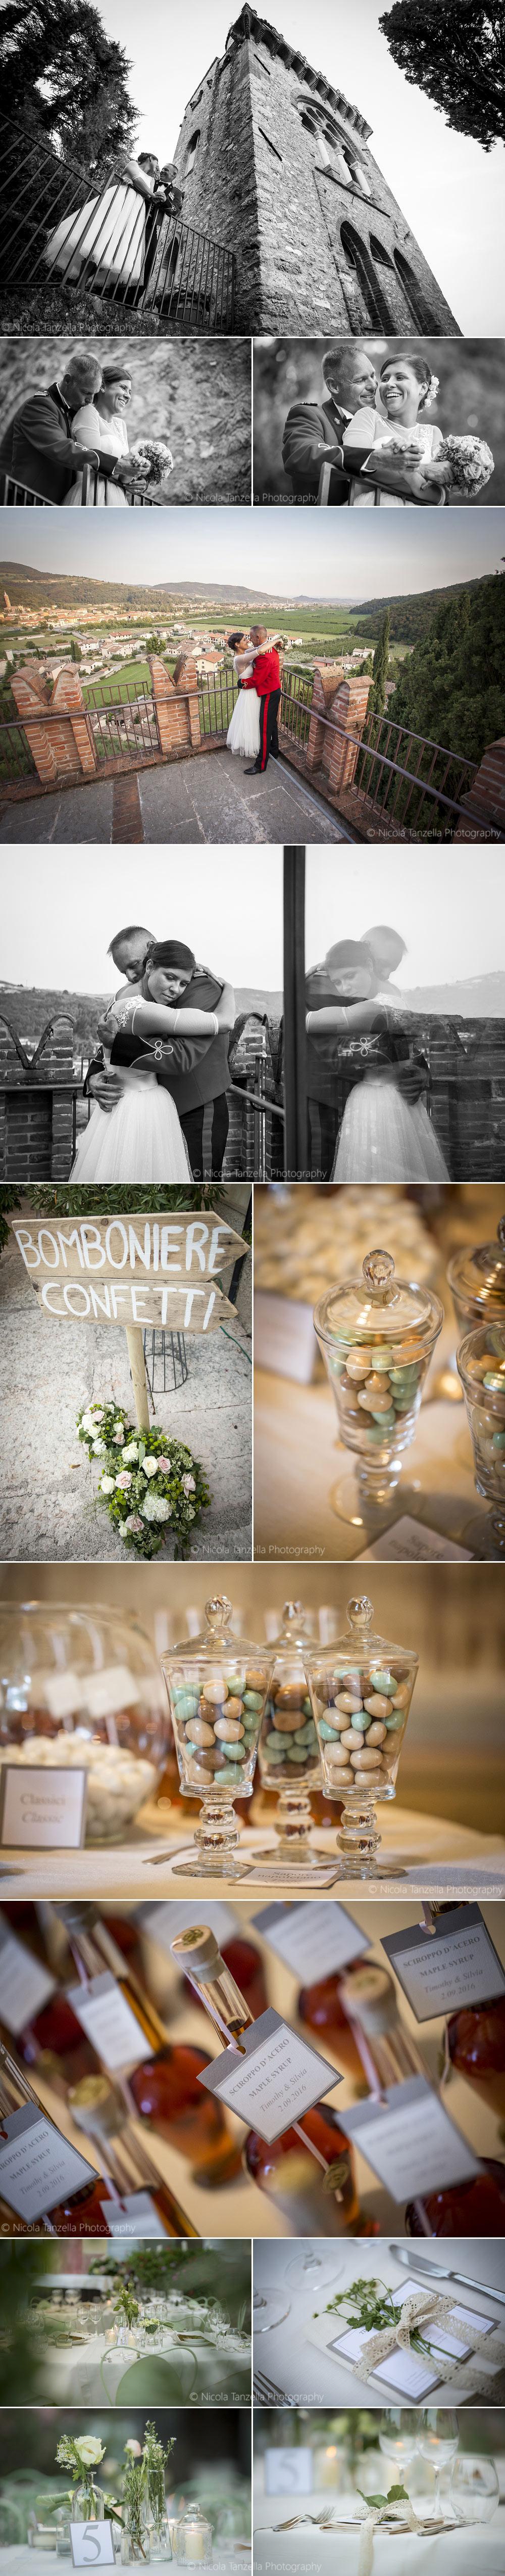 wedding in verona -7